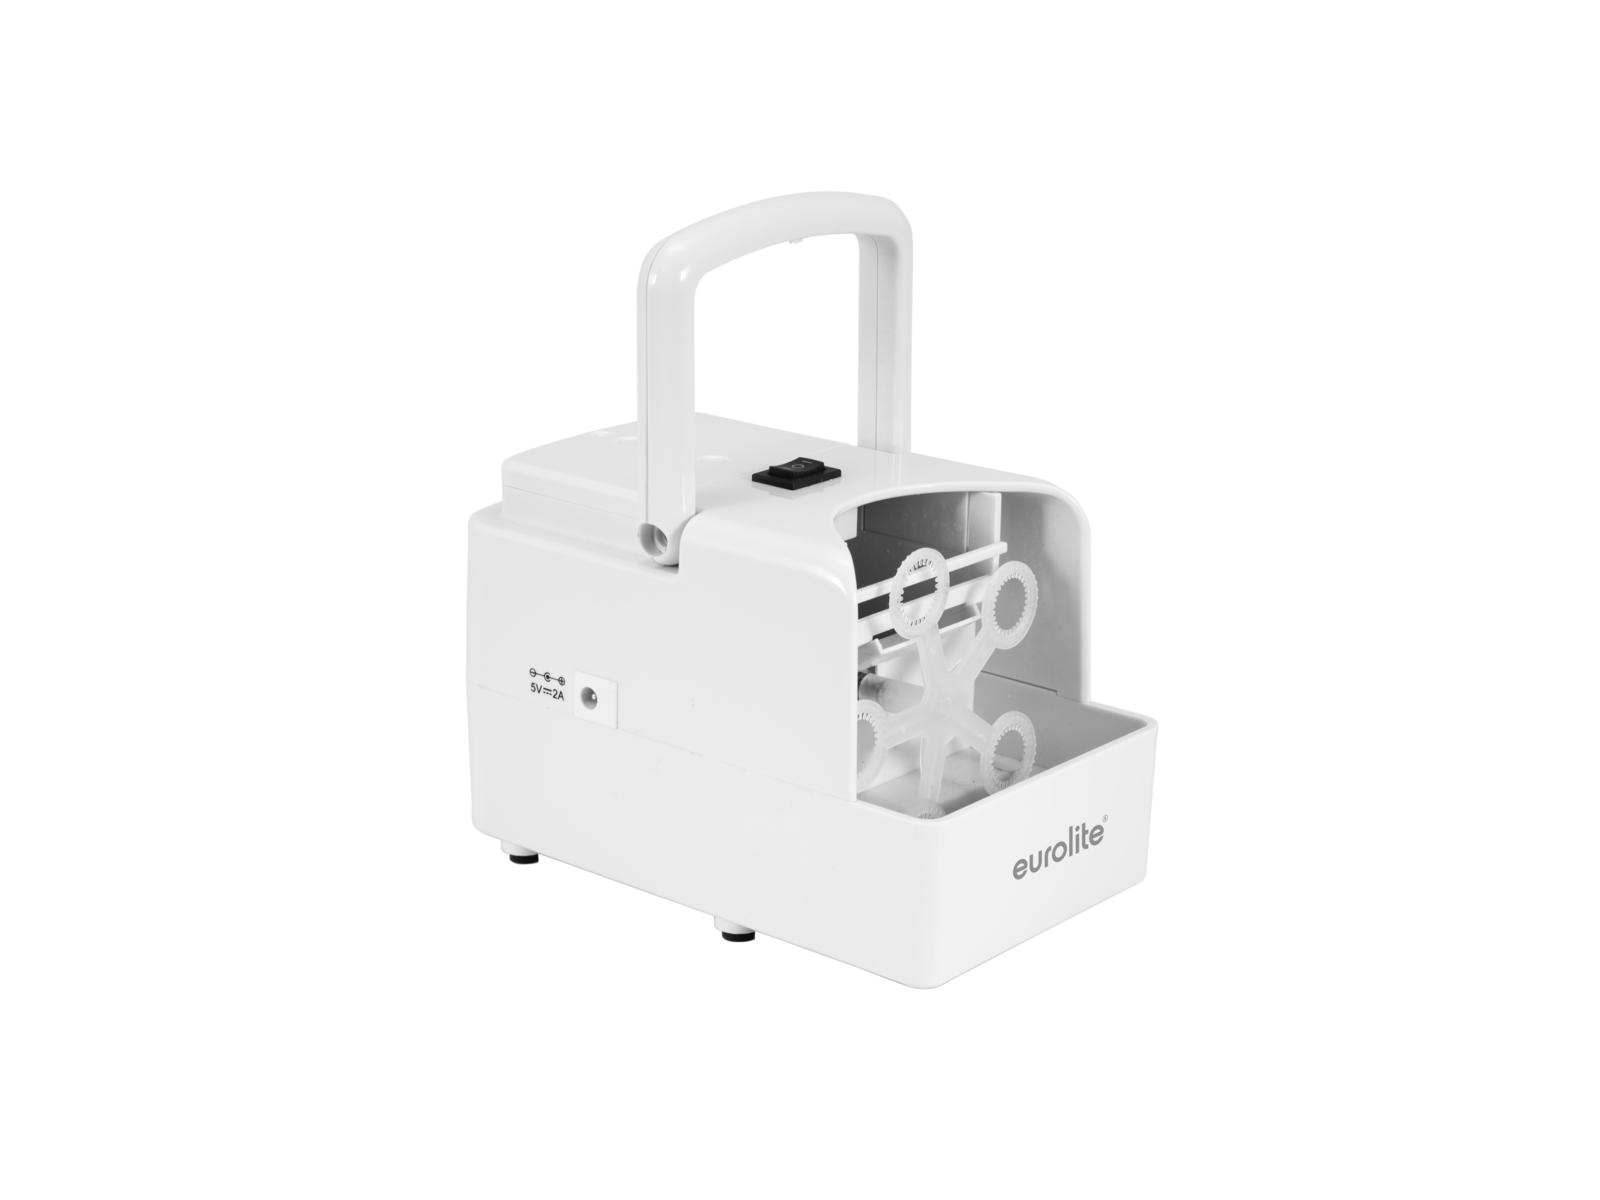 EUROLITE B-20 Mini-Seifenblasenmaschine